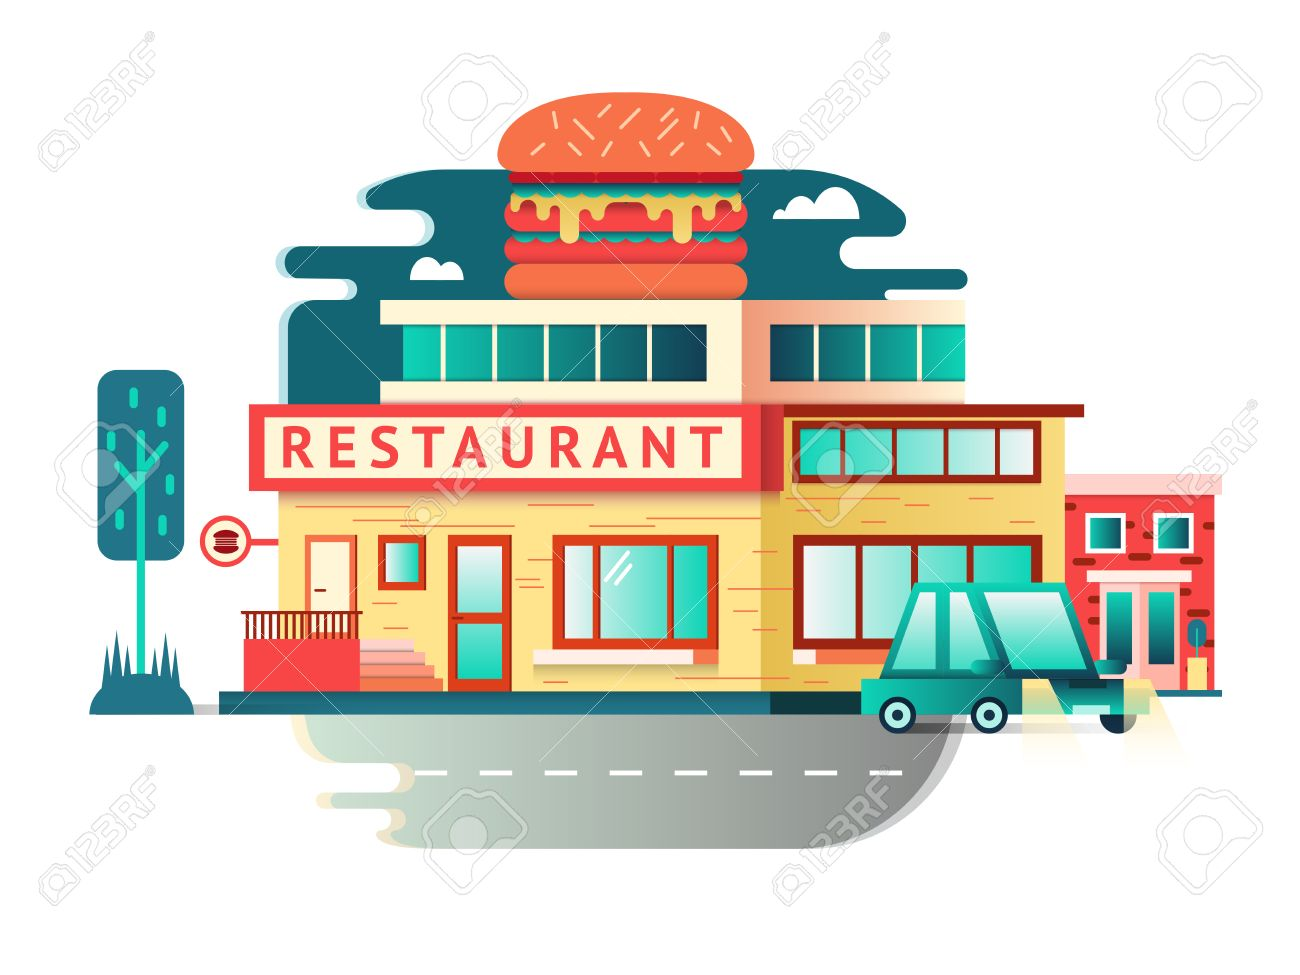 Building cartoon clipart restaurant building and restaurant building - Restaurant Building Flat Design Architecture Facade Food Cafe Construction Vector Illustration Stock Vector